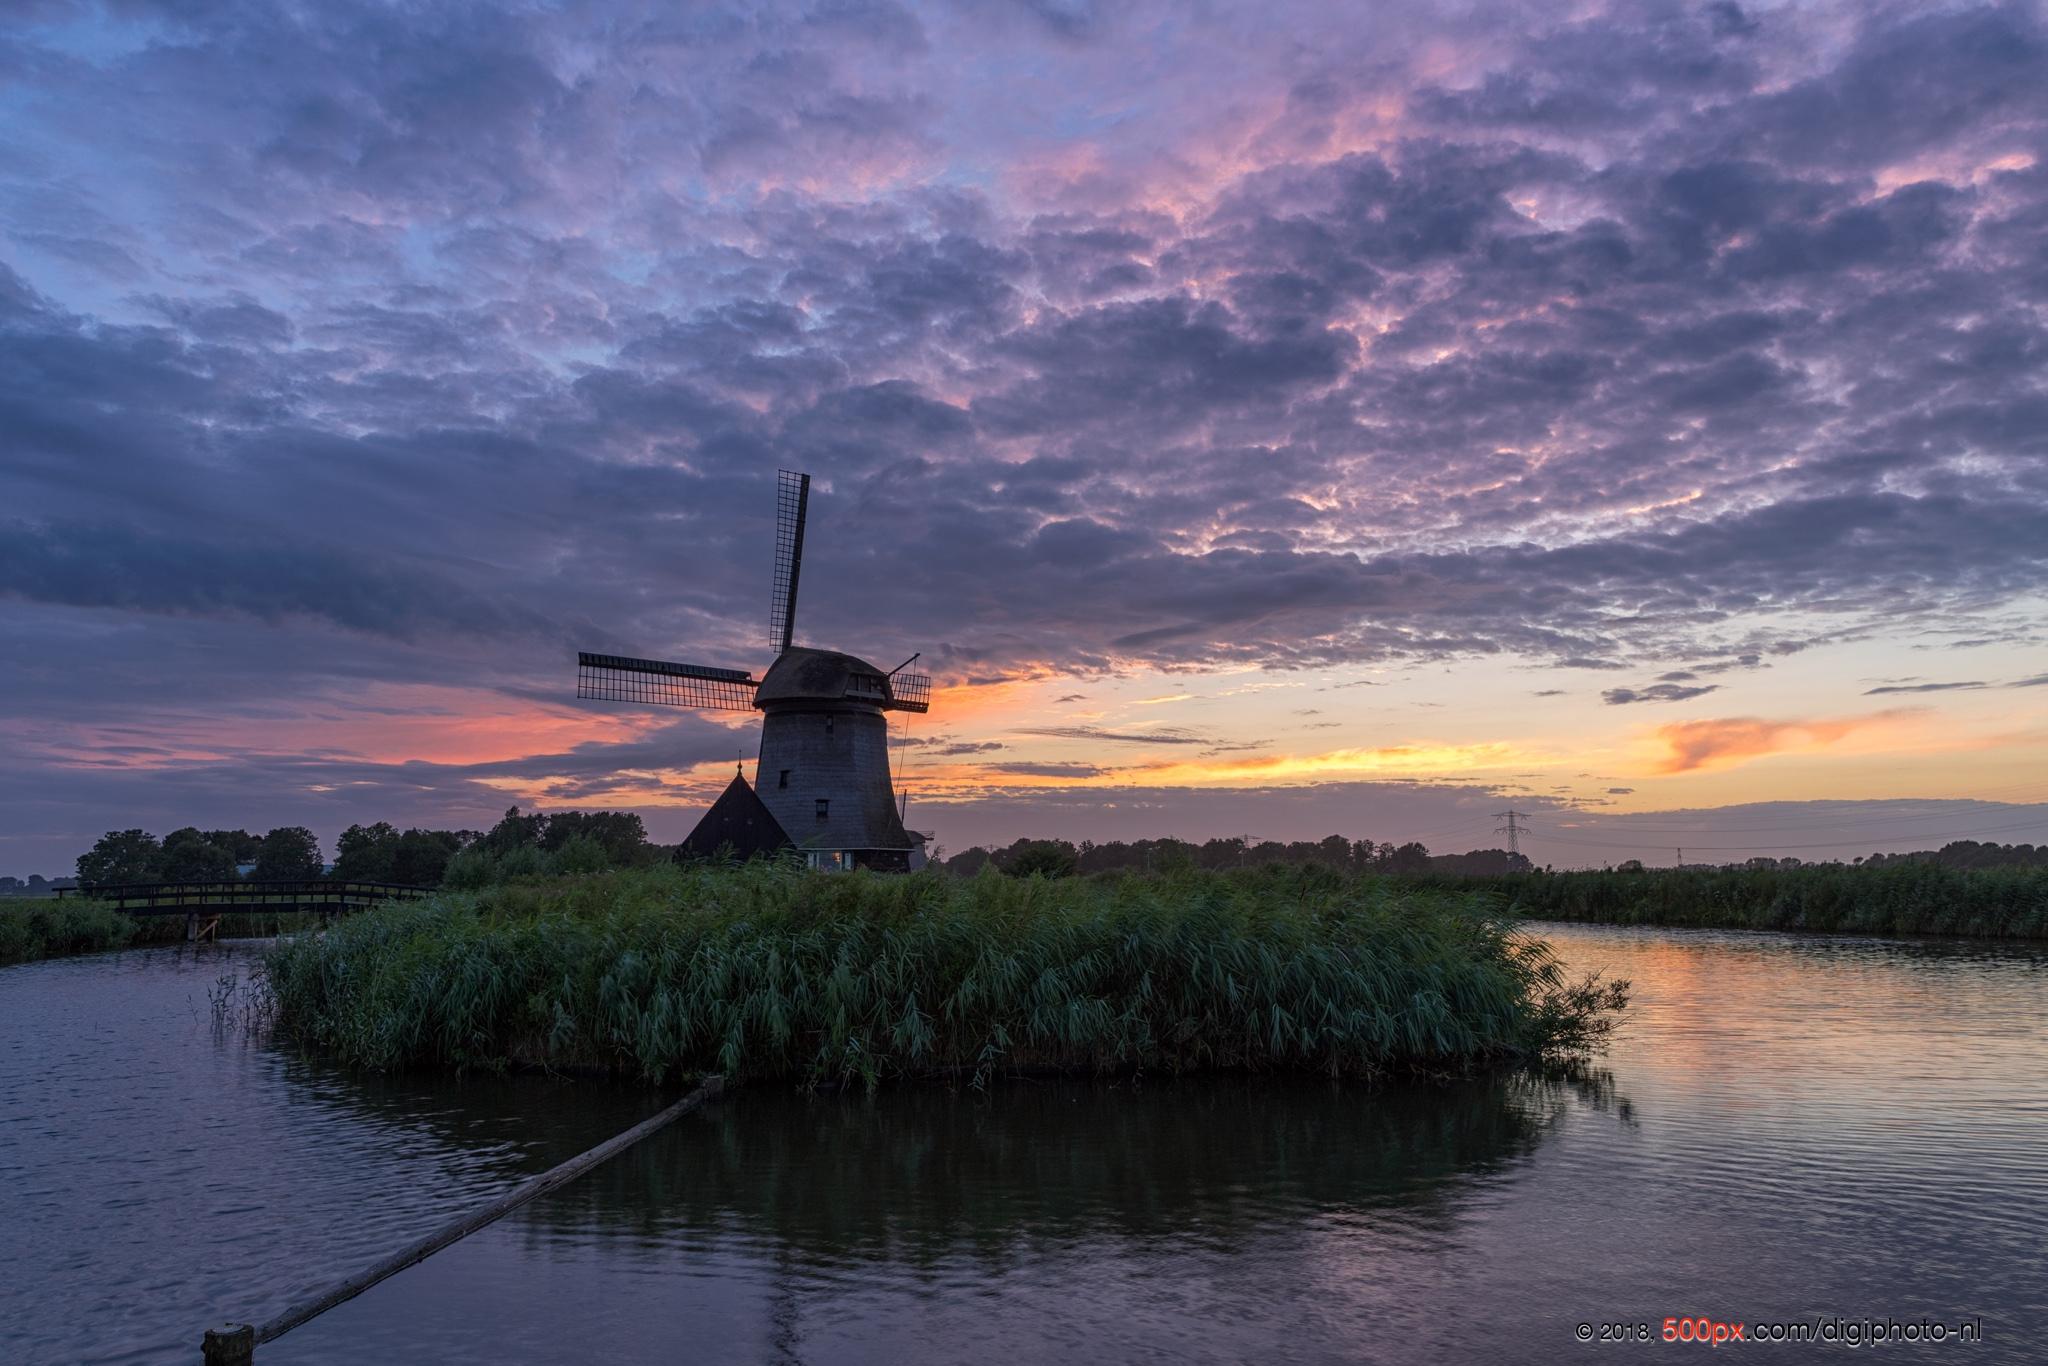 The windmills, Netherlands